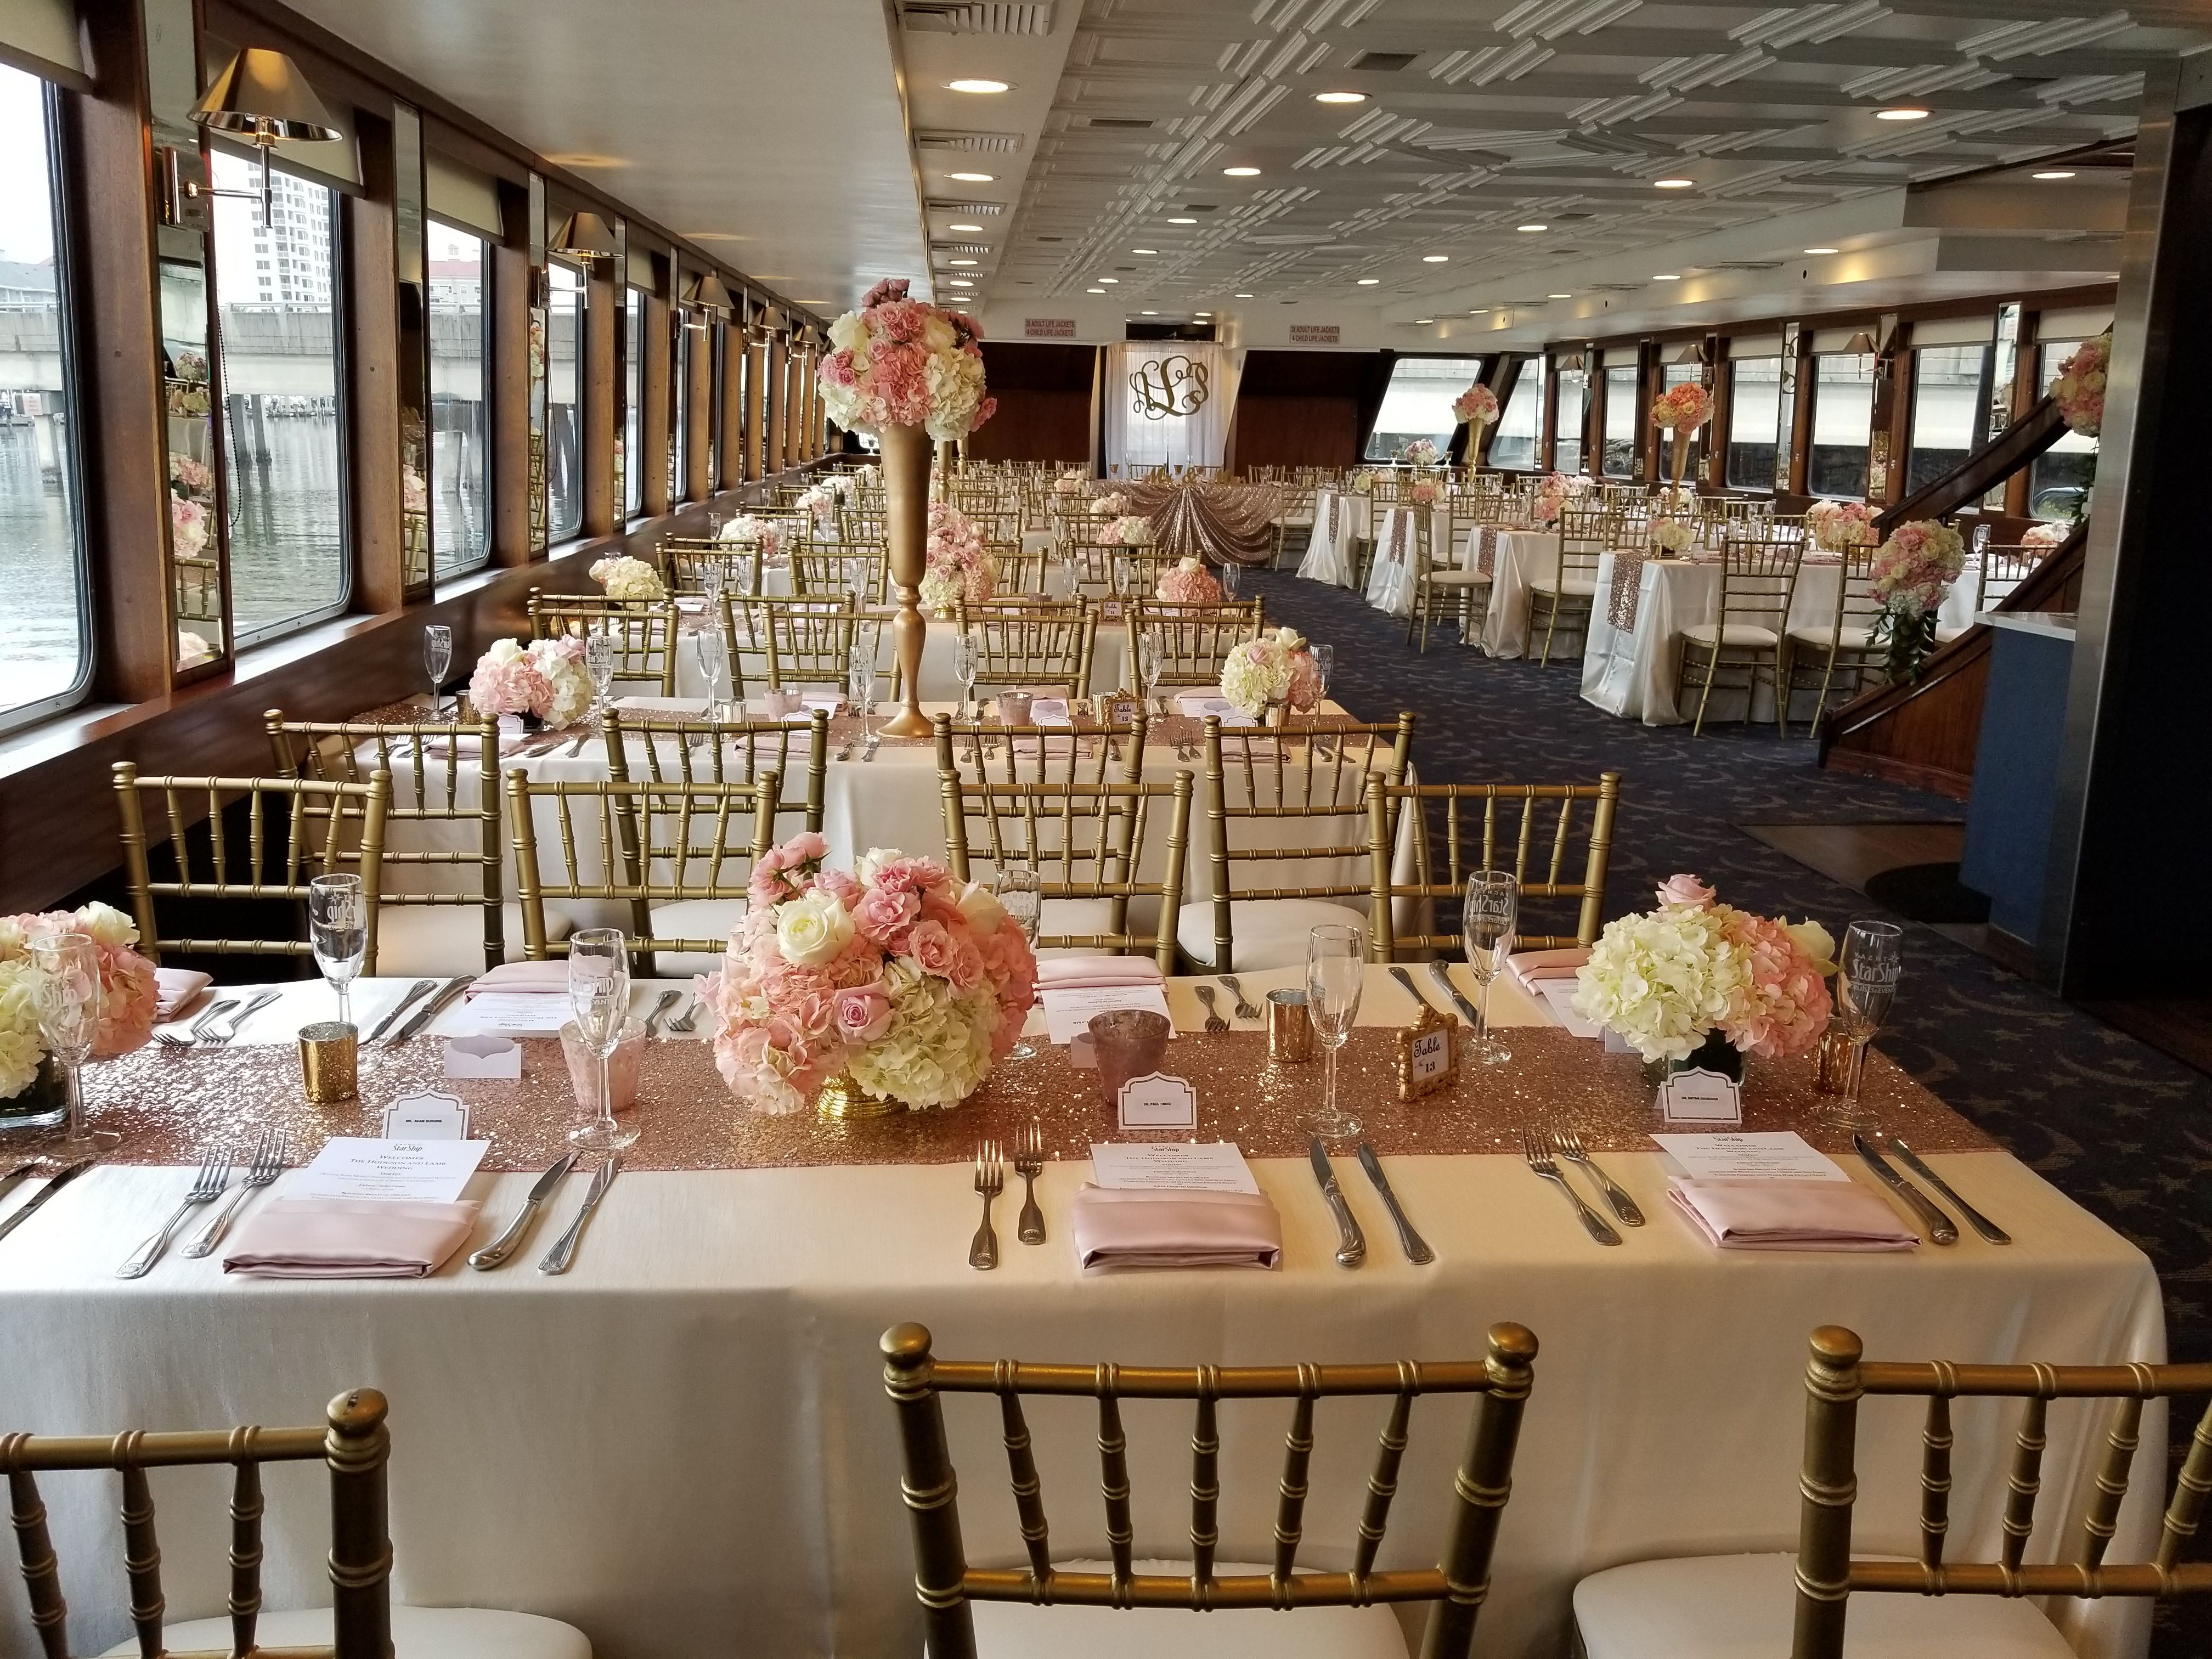 Yacht Starship Ii Yacht Wedding Decor Yacht Wedding Boat Wedding Decorations